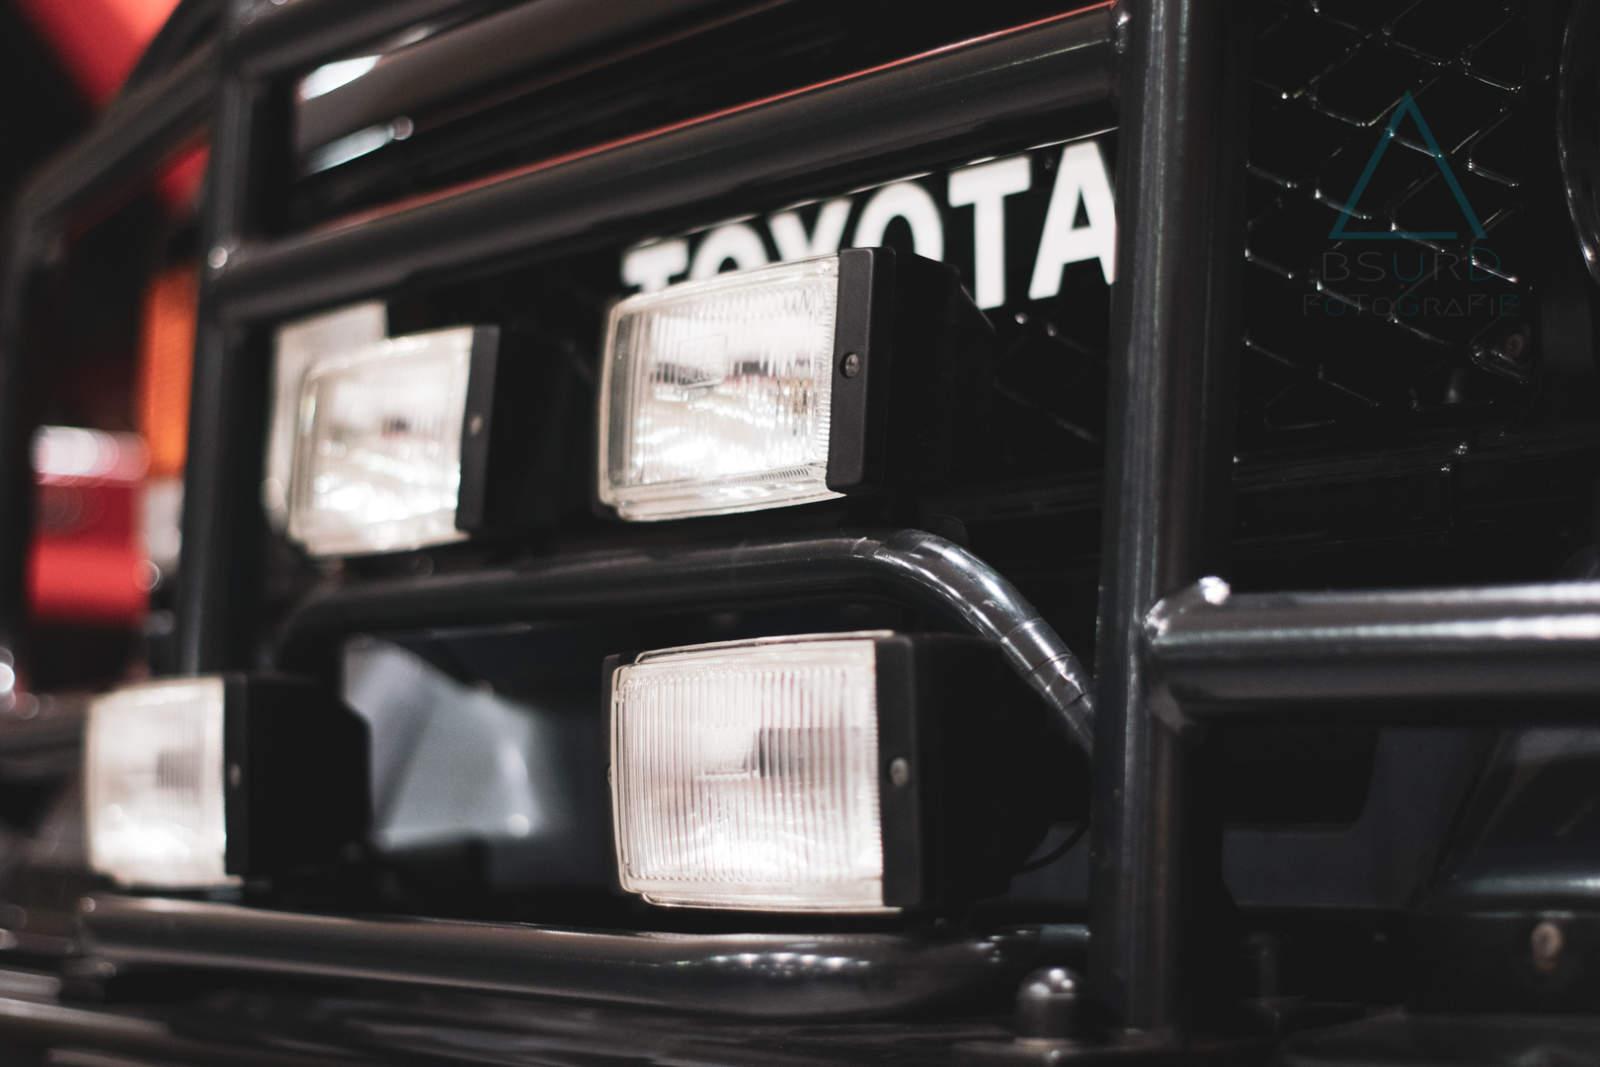 2019-01-05-Toyota-Collection-Koeln - DSC01719-edit-61.jpg